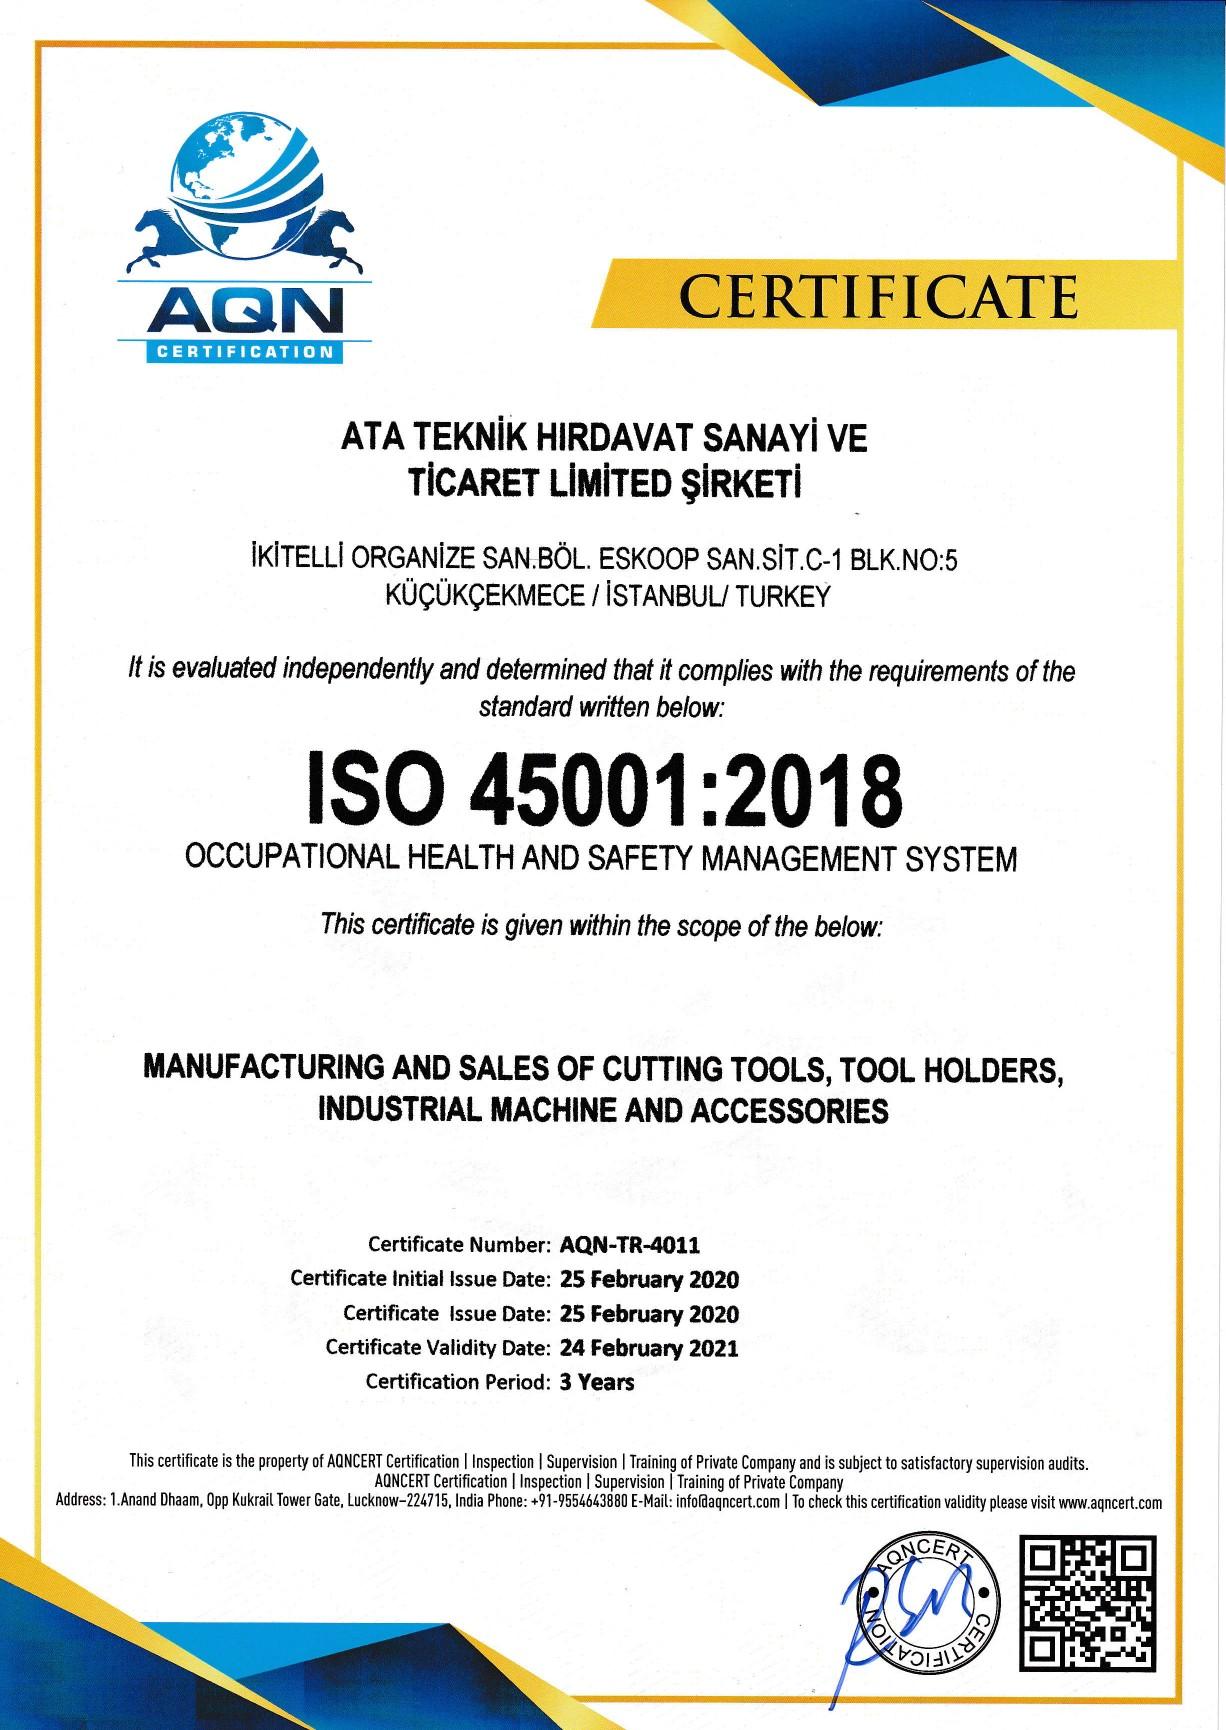 Heikenei ISO45001 Certificate